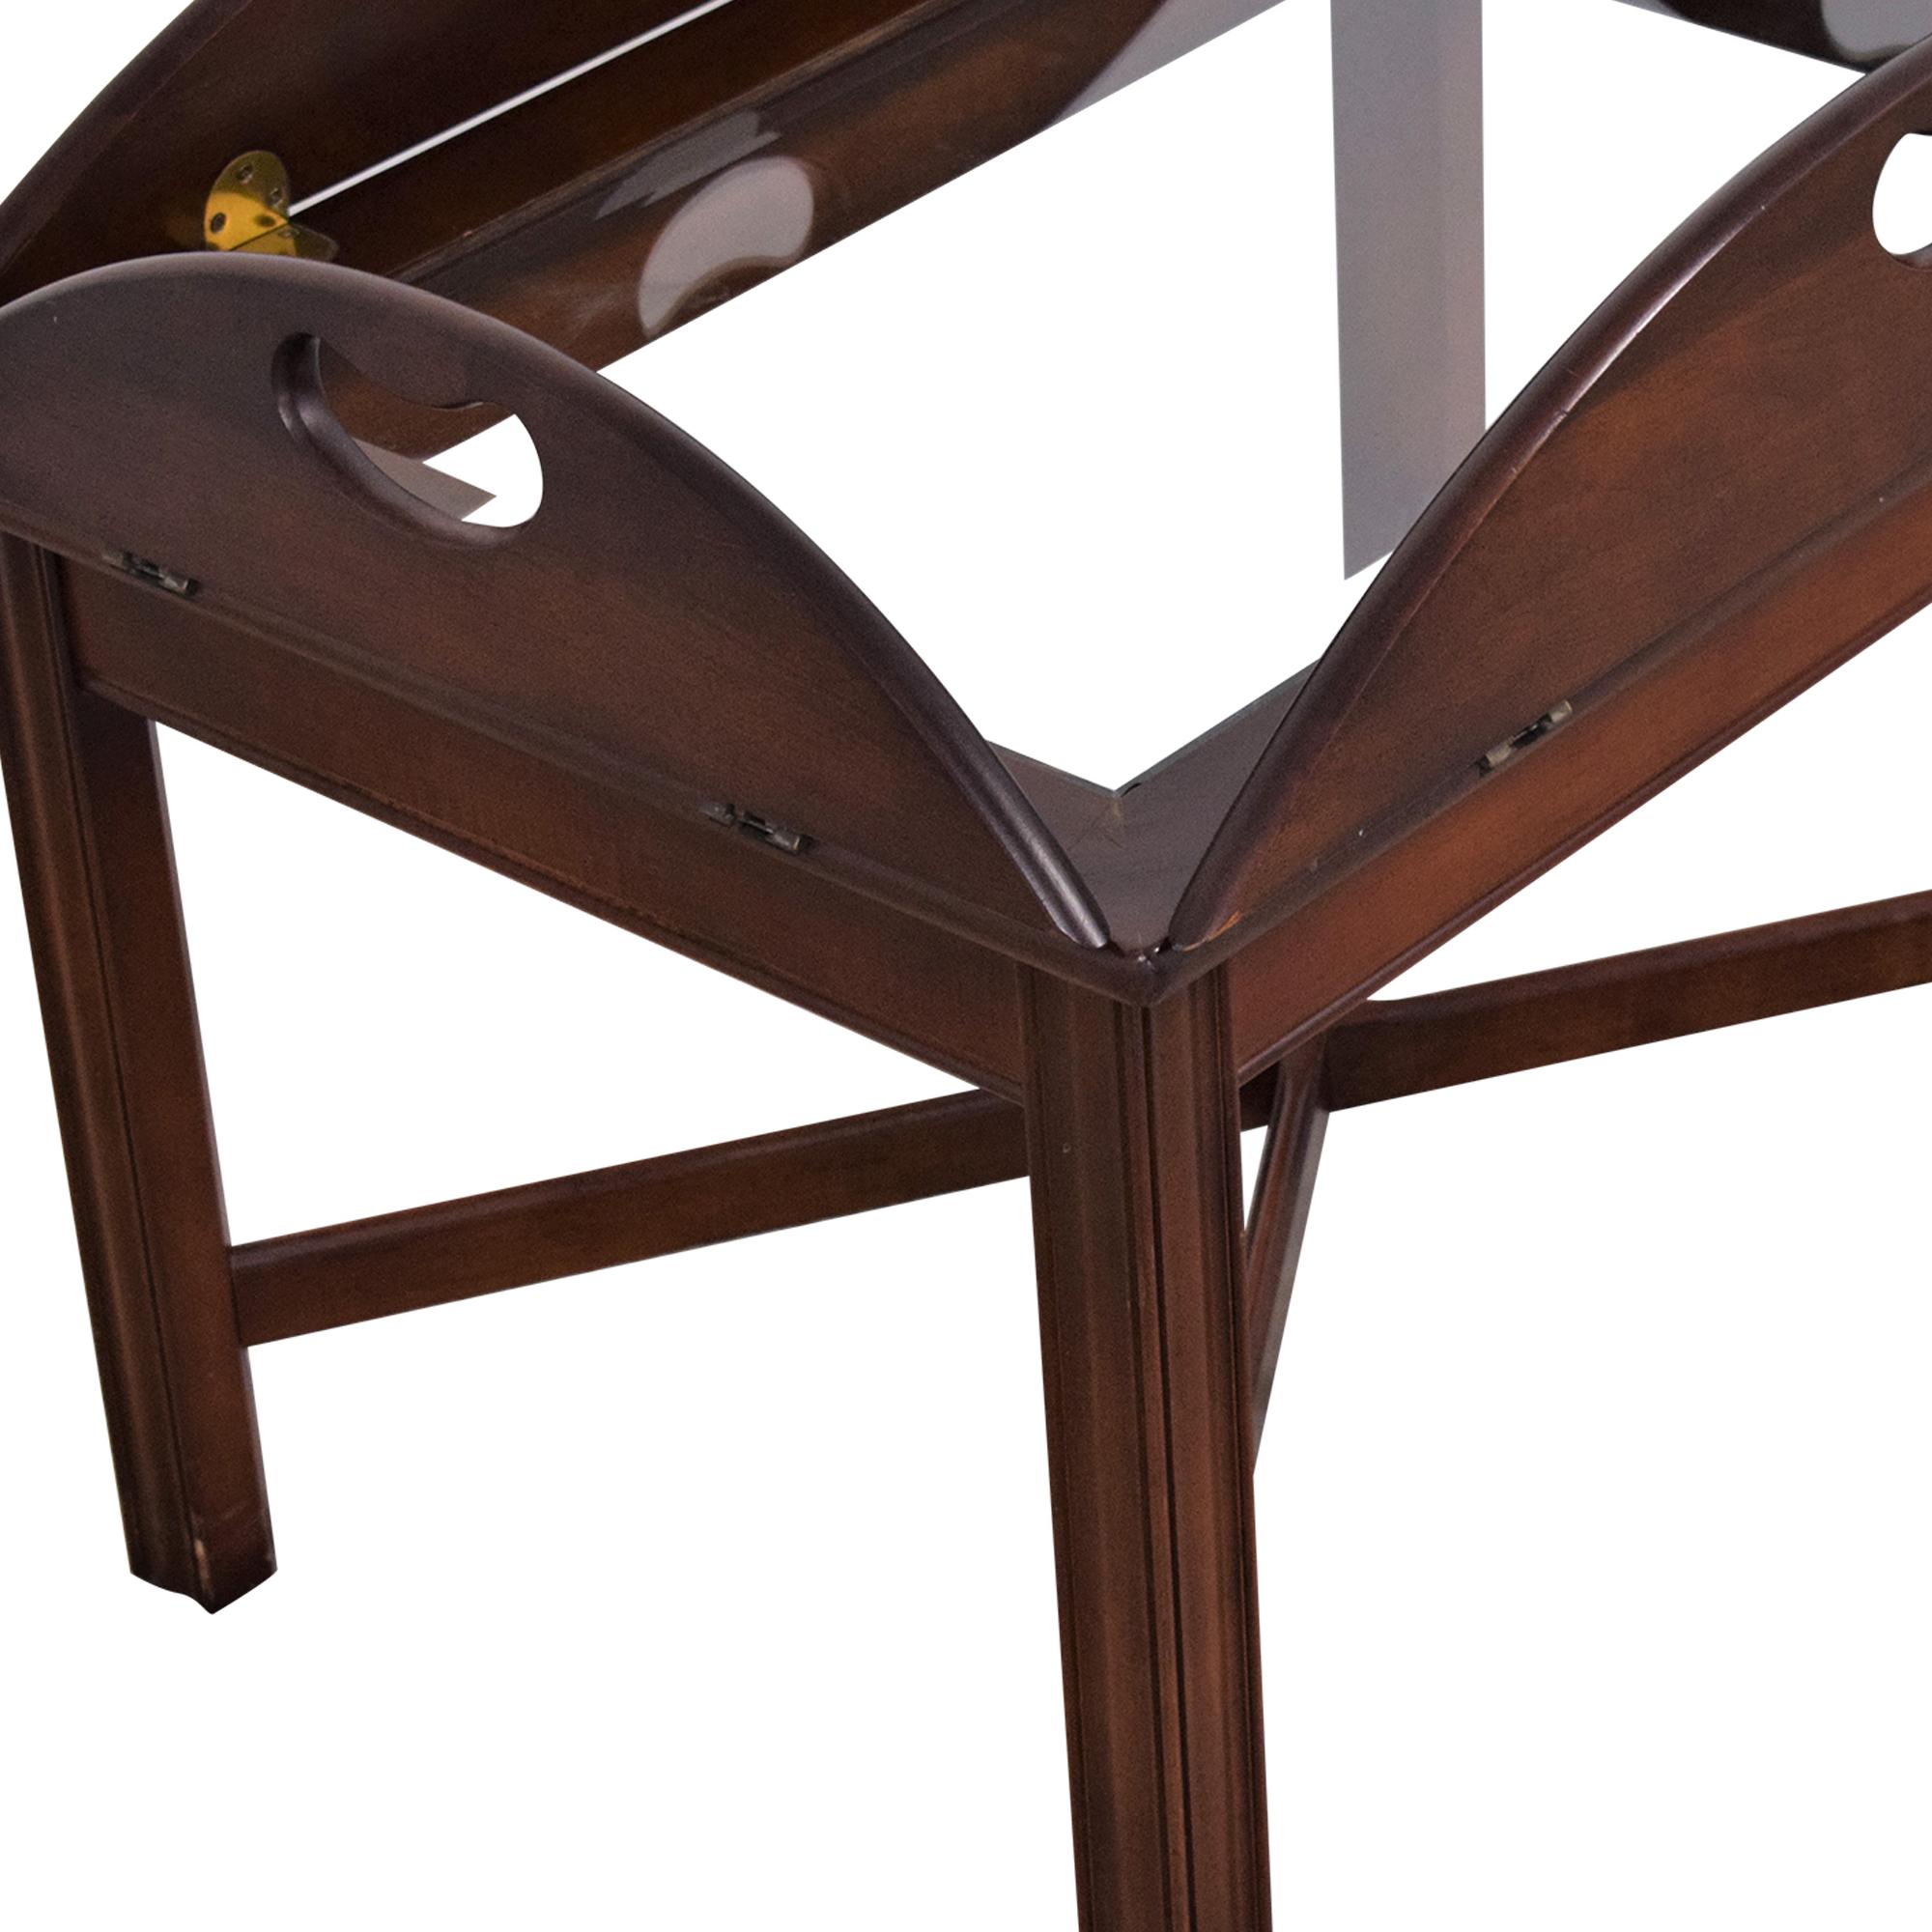 Huffman Koos Huffman Koos Fold Down Coffee Table dimensions